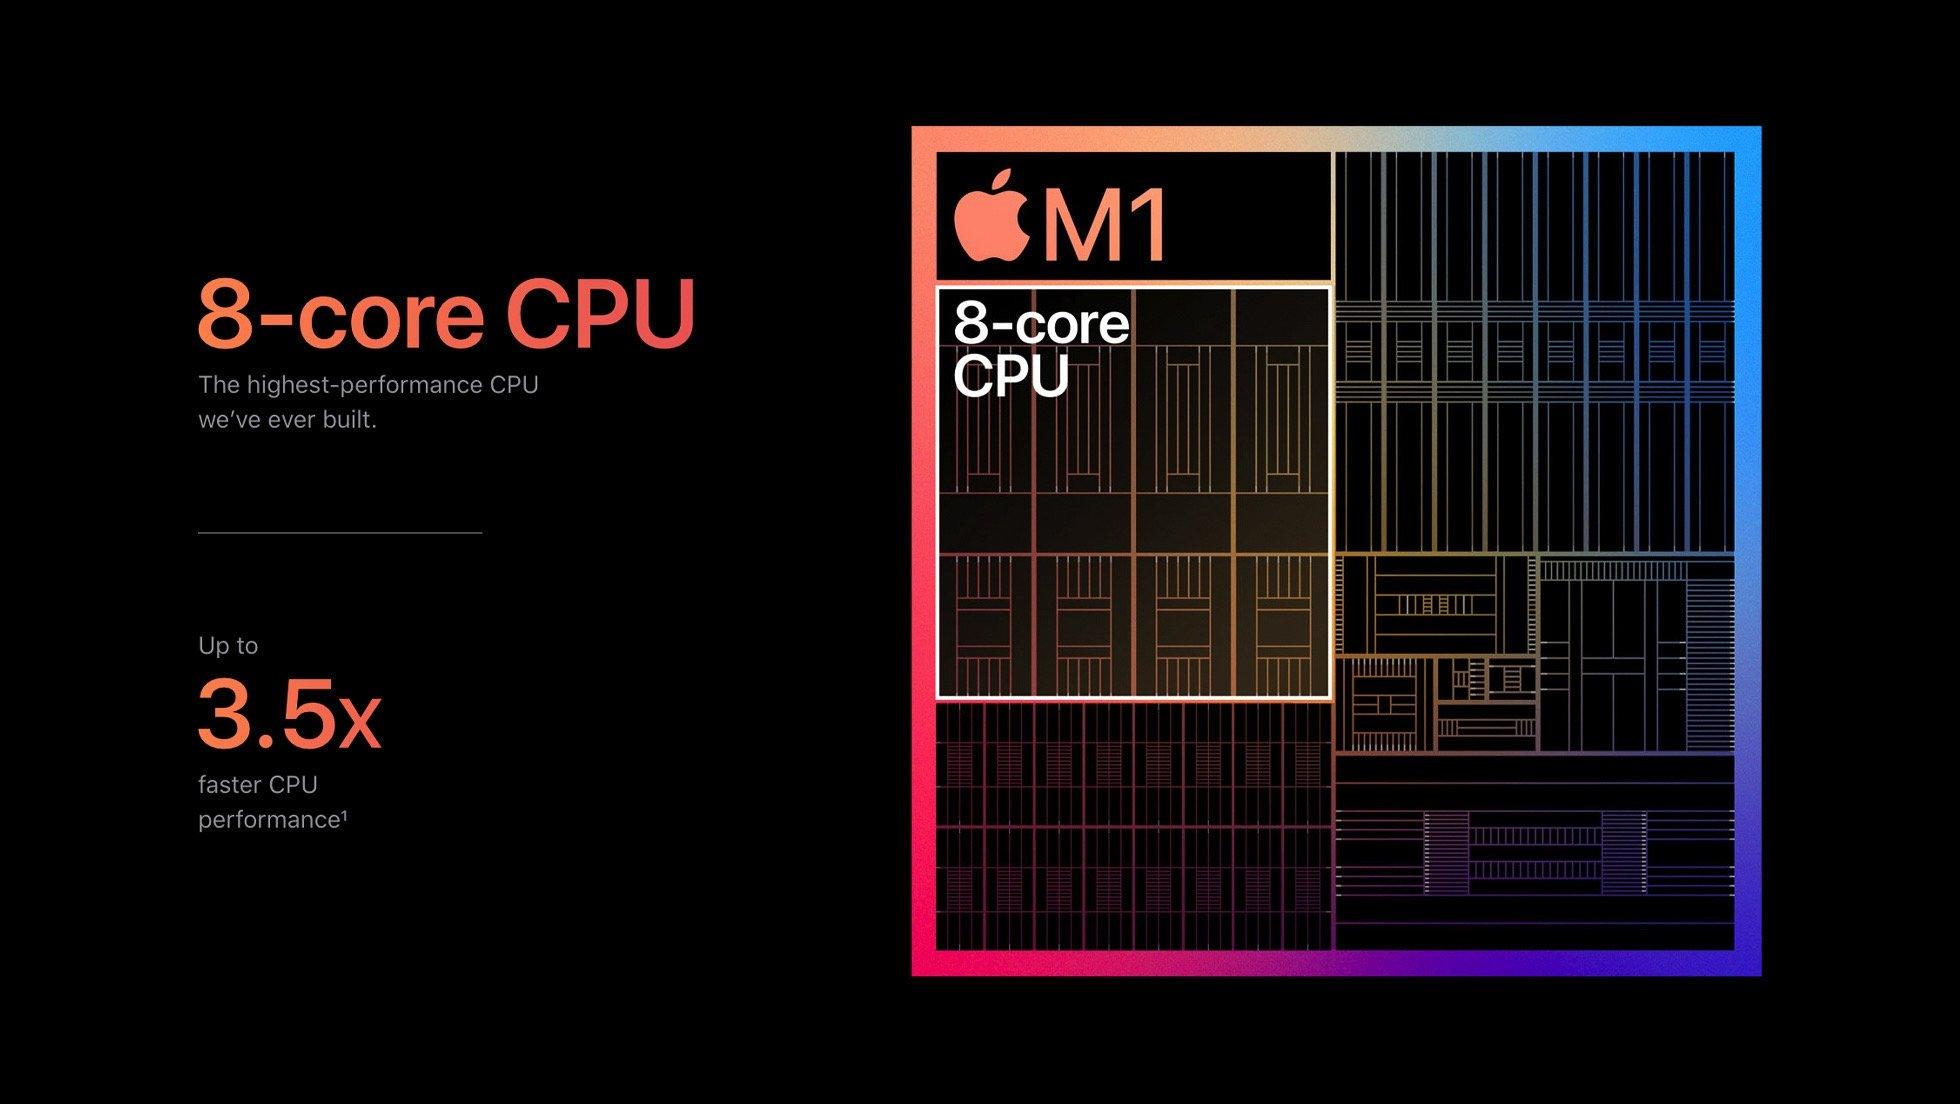 processador m1 características internas